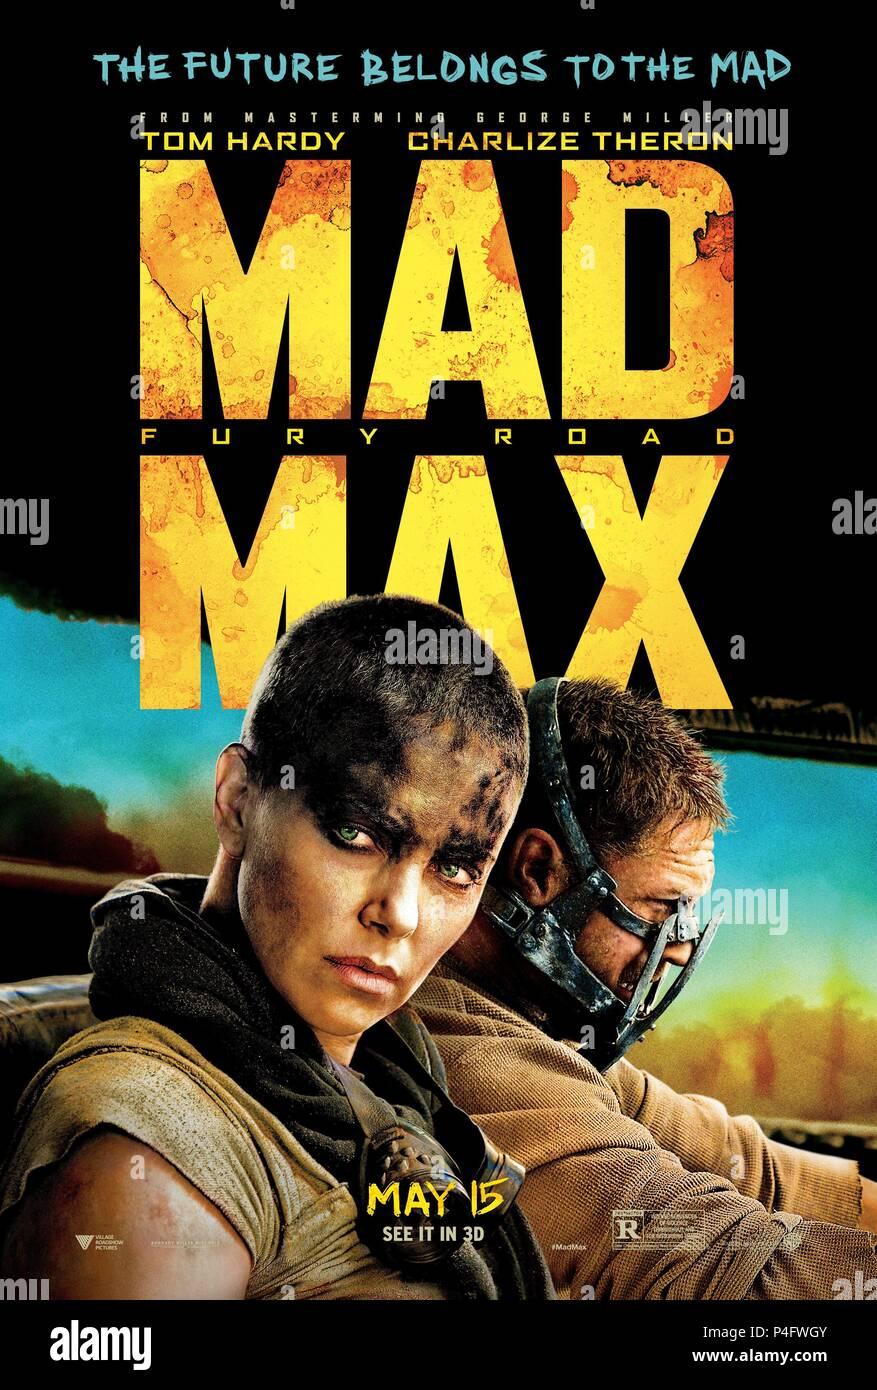 Original Film Title: MAD MAX: FURY ROAD.  English Title: MAD MAX: FURY ROAD.  Film Director: GEORGE MILLER.  Year: 2015. Credit: VILLAGE ROADSHOW / Album Stock Photo